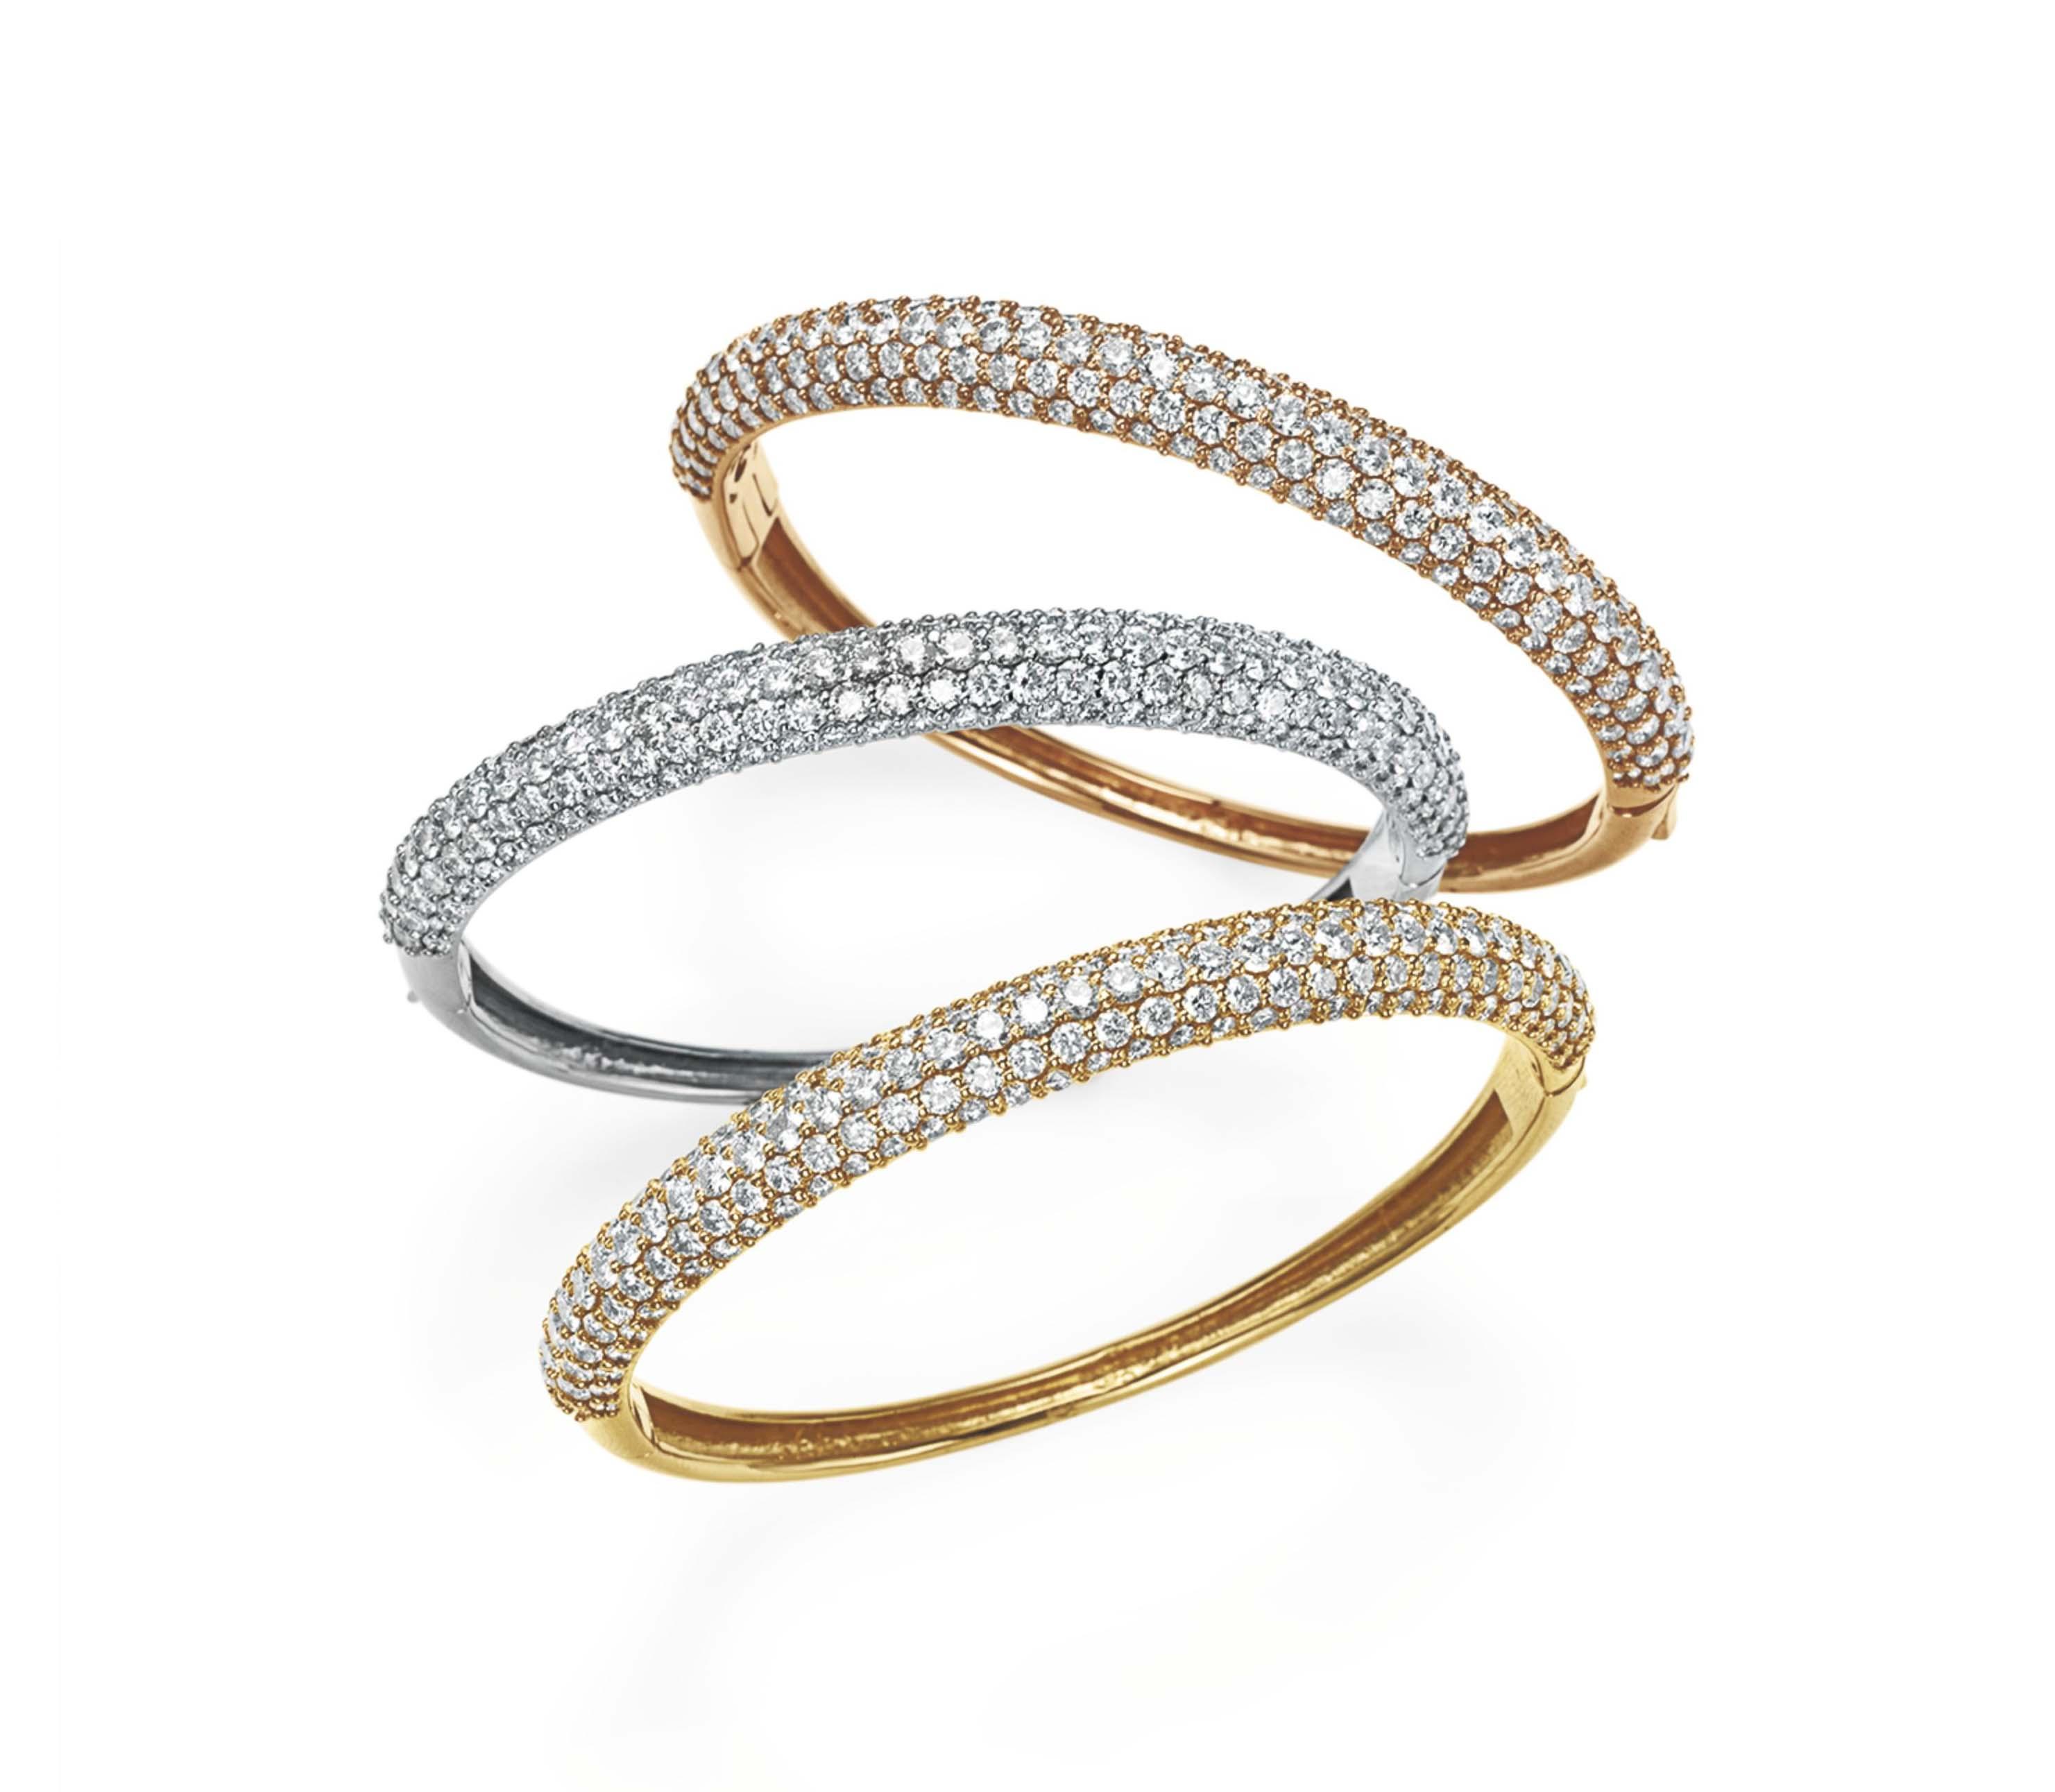 A SET OF THREE GOLD AND DIAMOND BANGLE BRACELETS